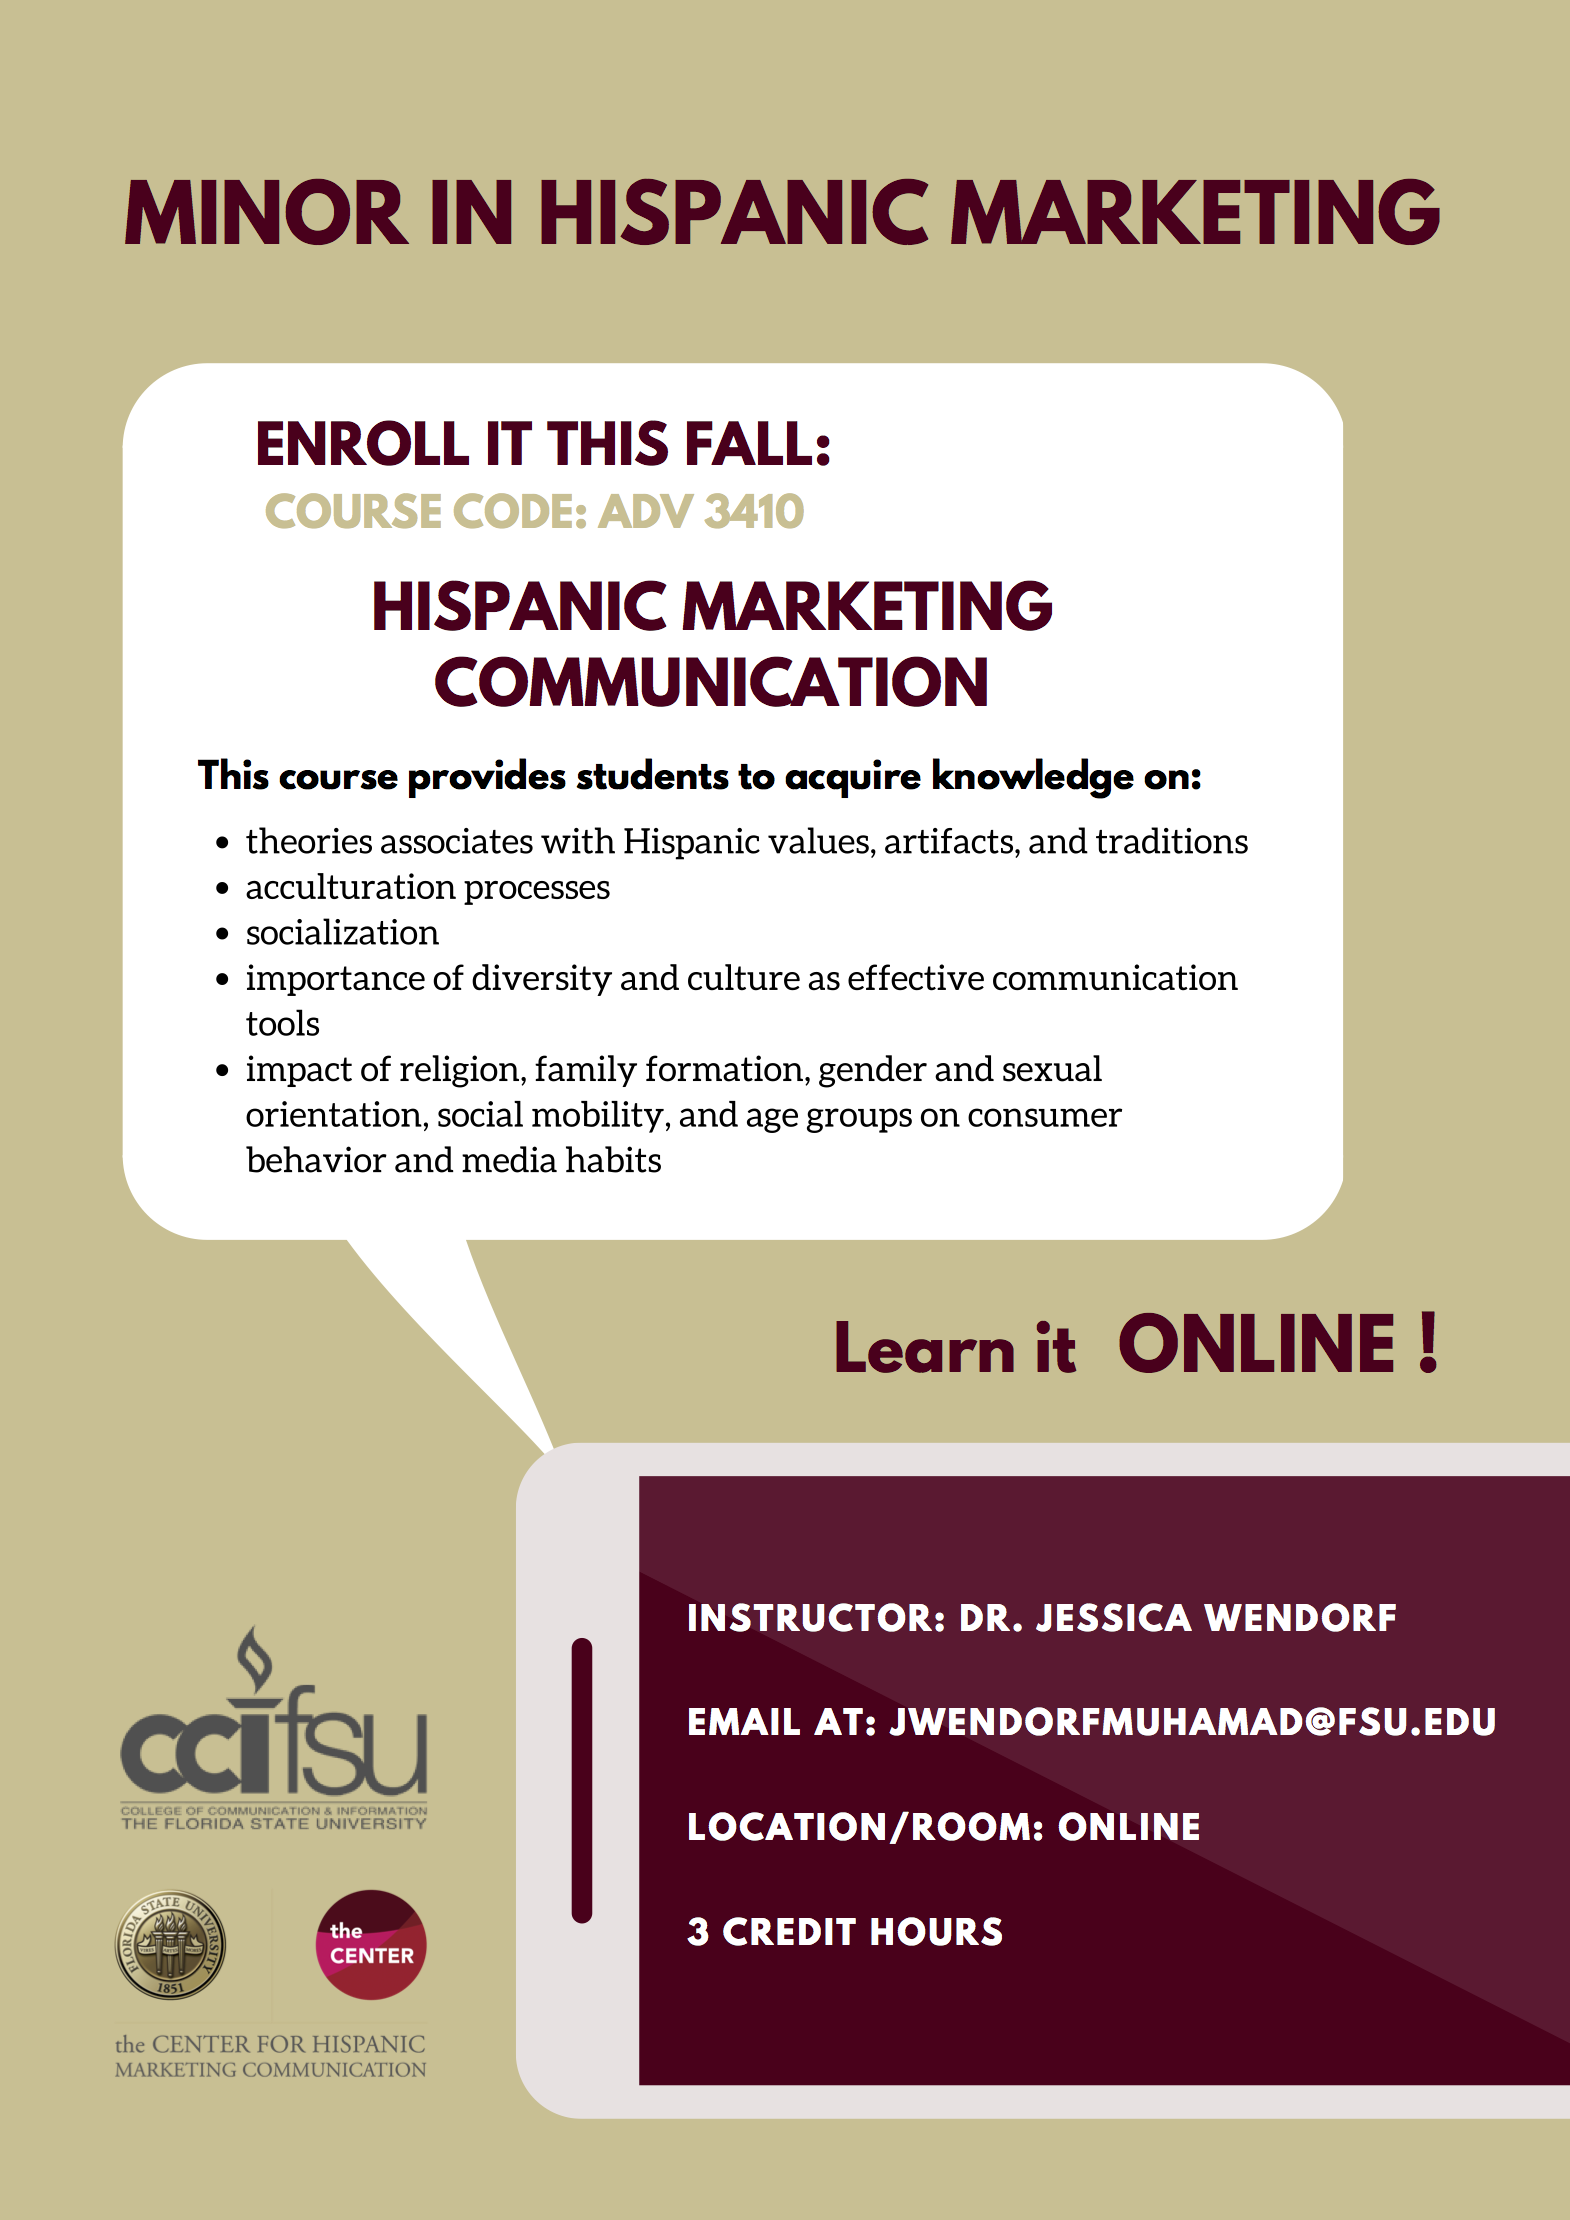 hispanic marketing communication The center for hispanic marketing communication at florida state university  named rafael jaramillo from emerson, beth f trac.